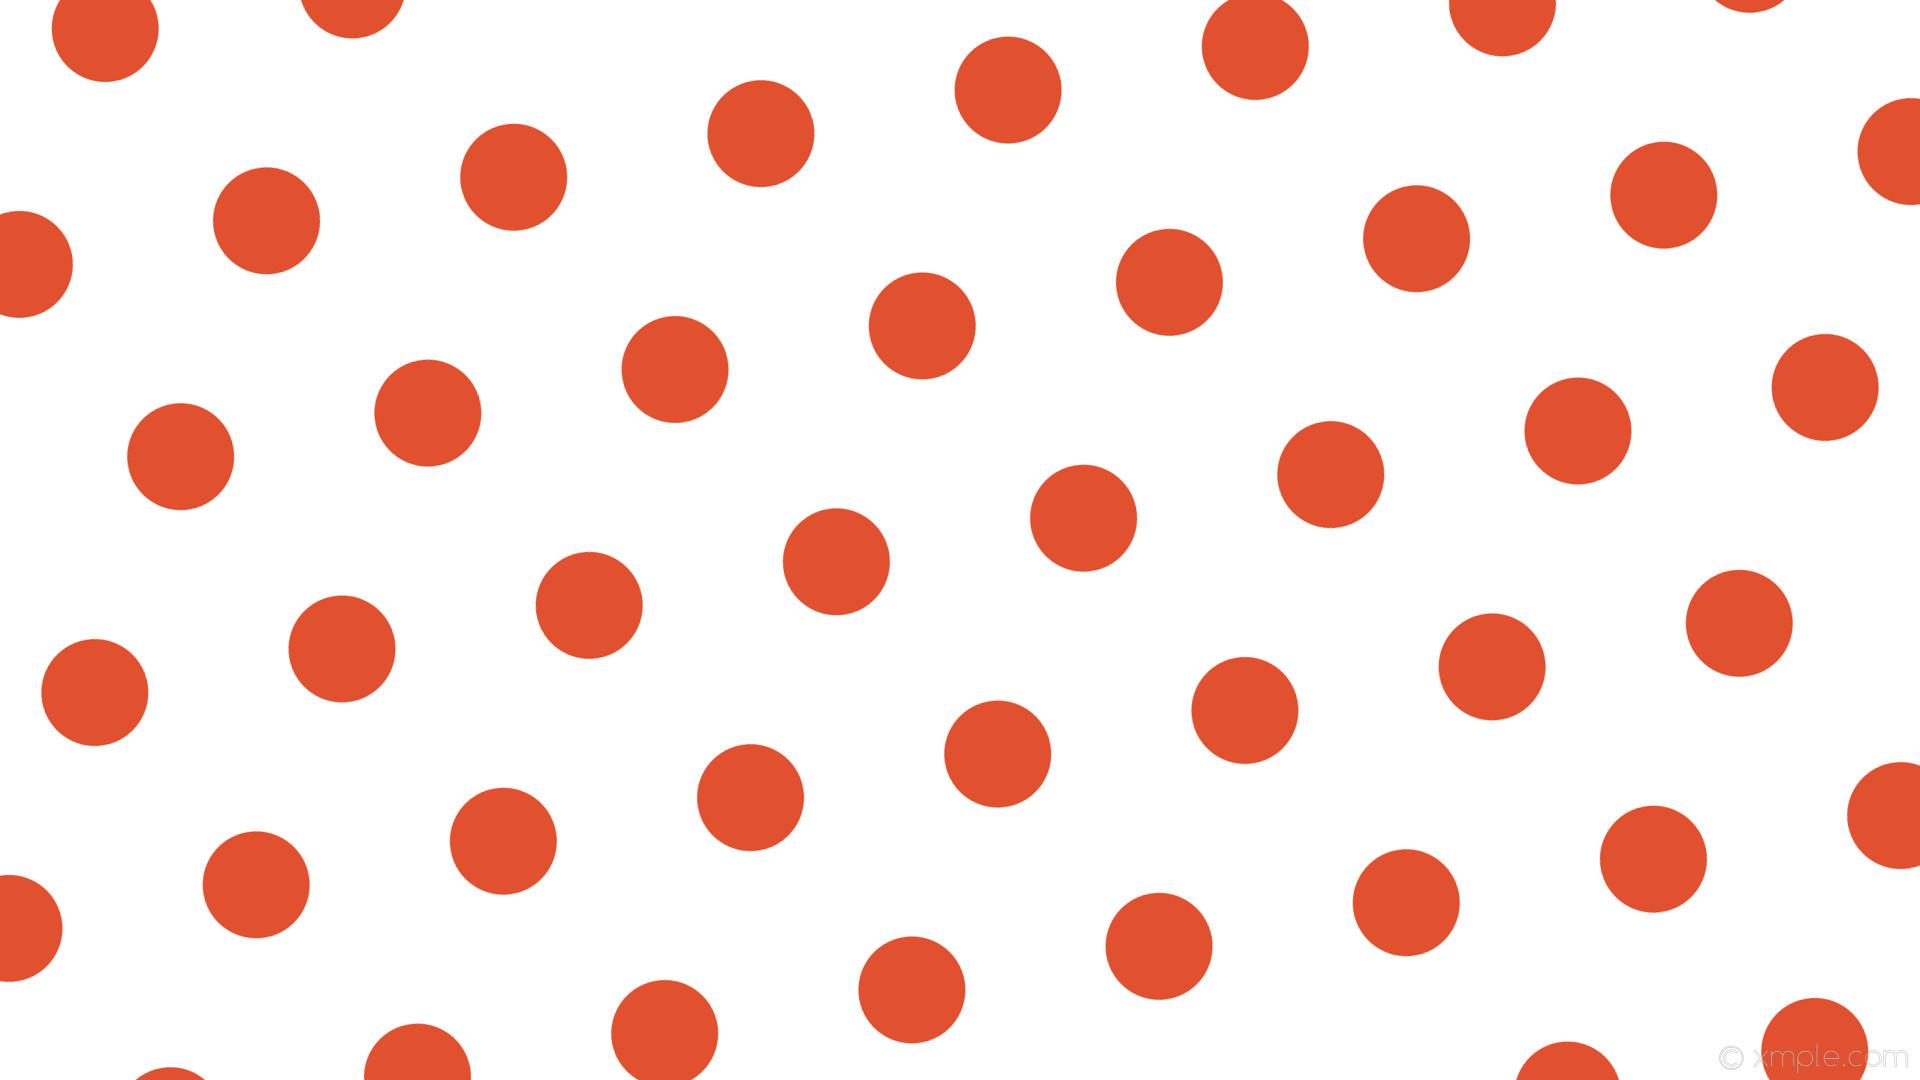 wallpaper white polka dots red hexagon #ffffff #e1512f diagonal 10° 107px  251px